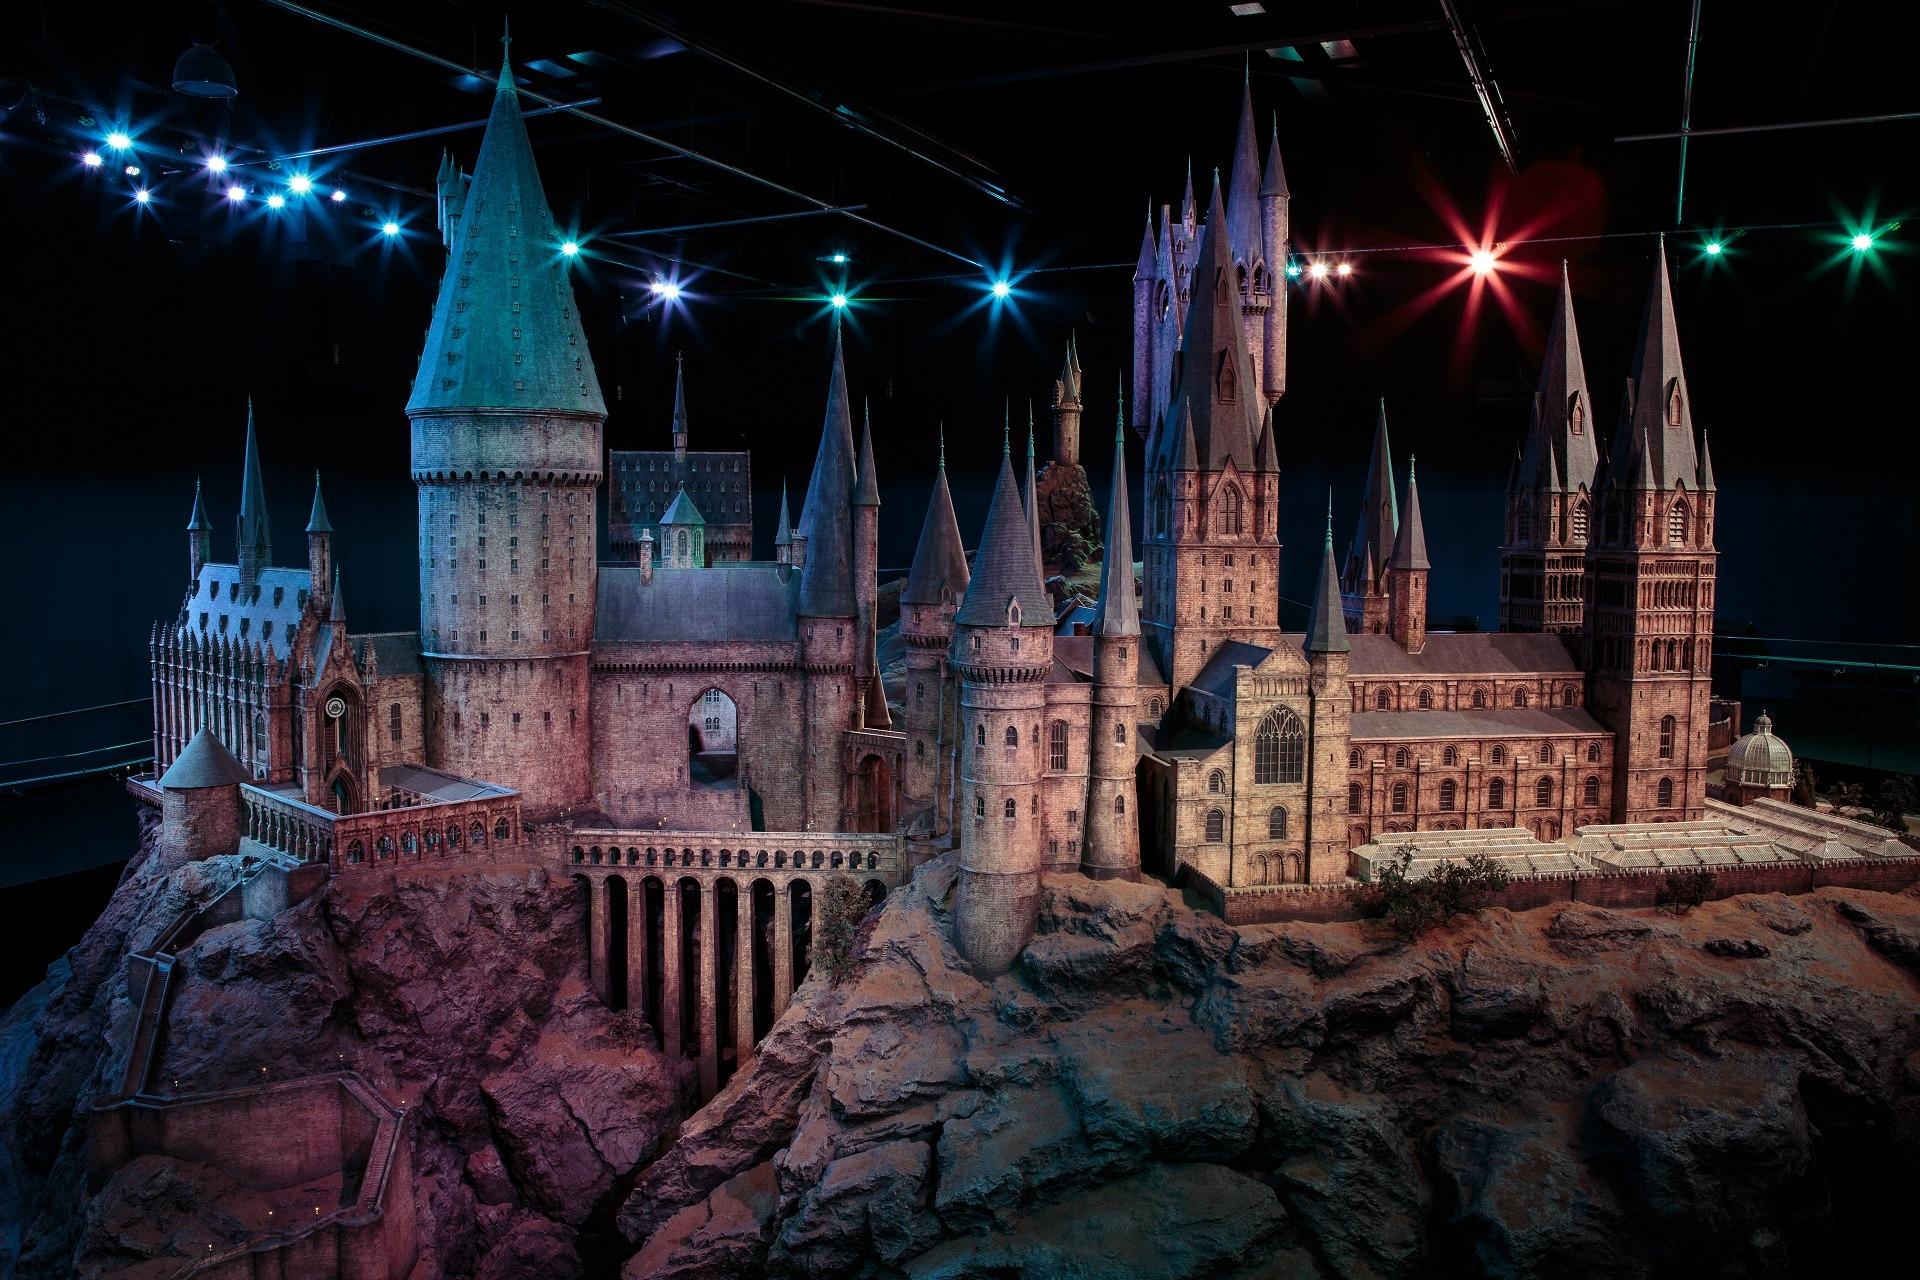 Warner Bros. Studio Tour London The Making of Harry Potter